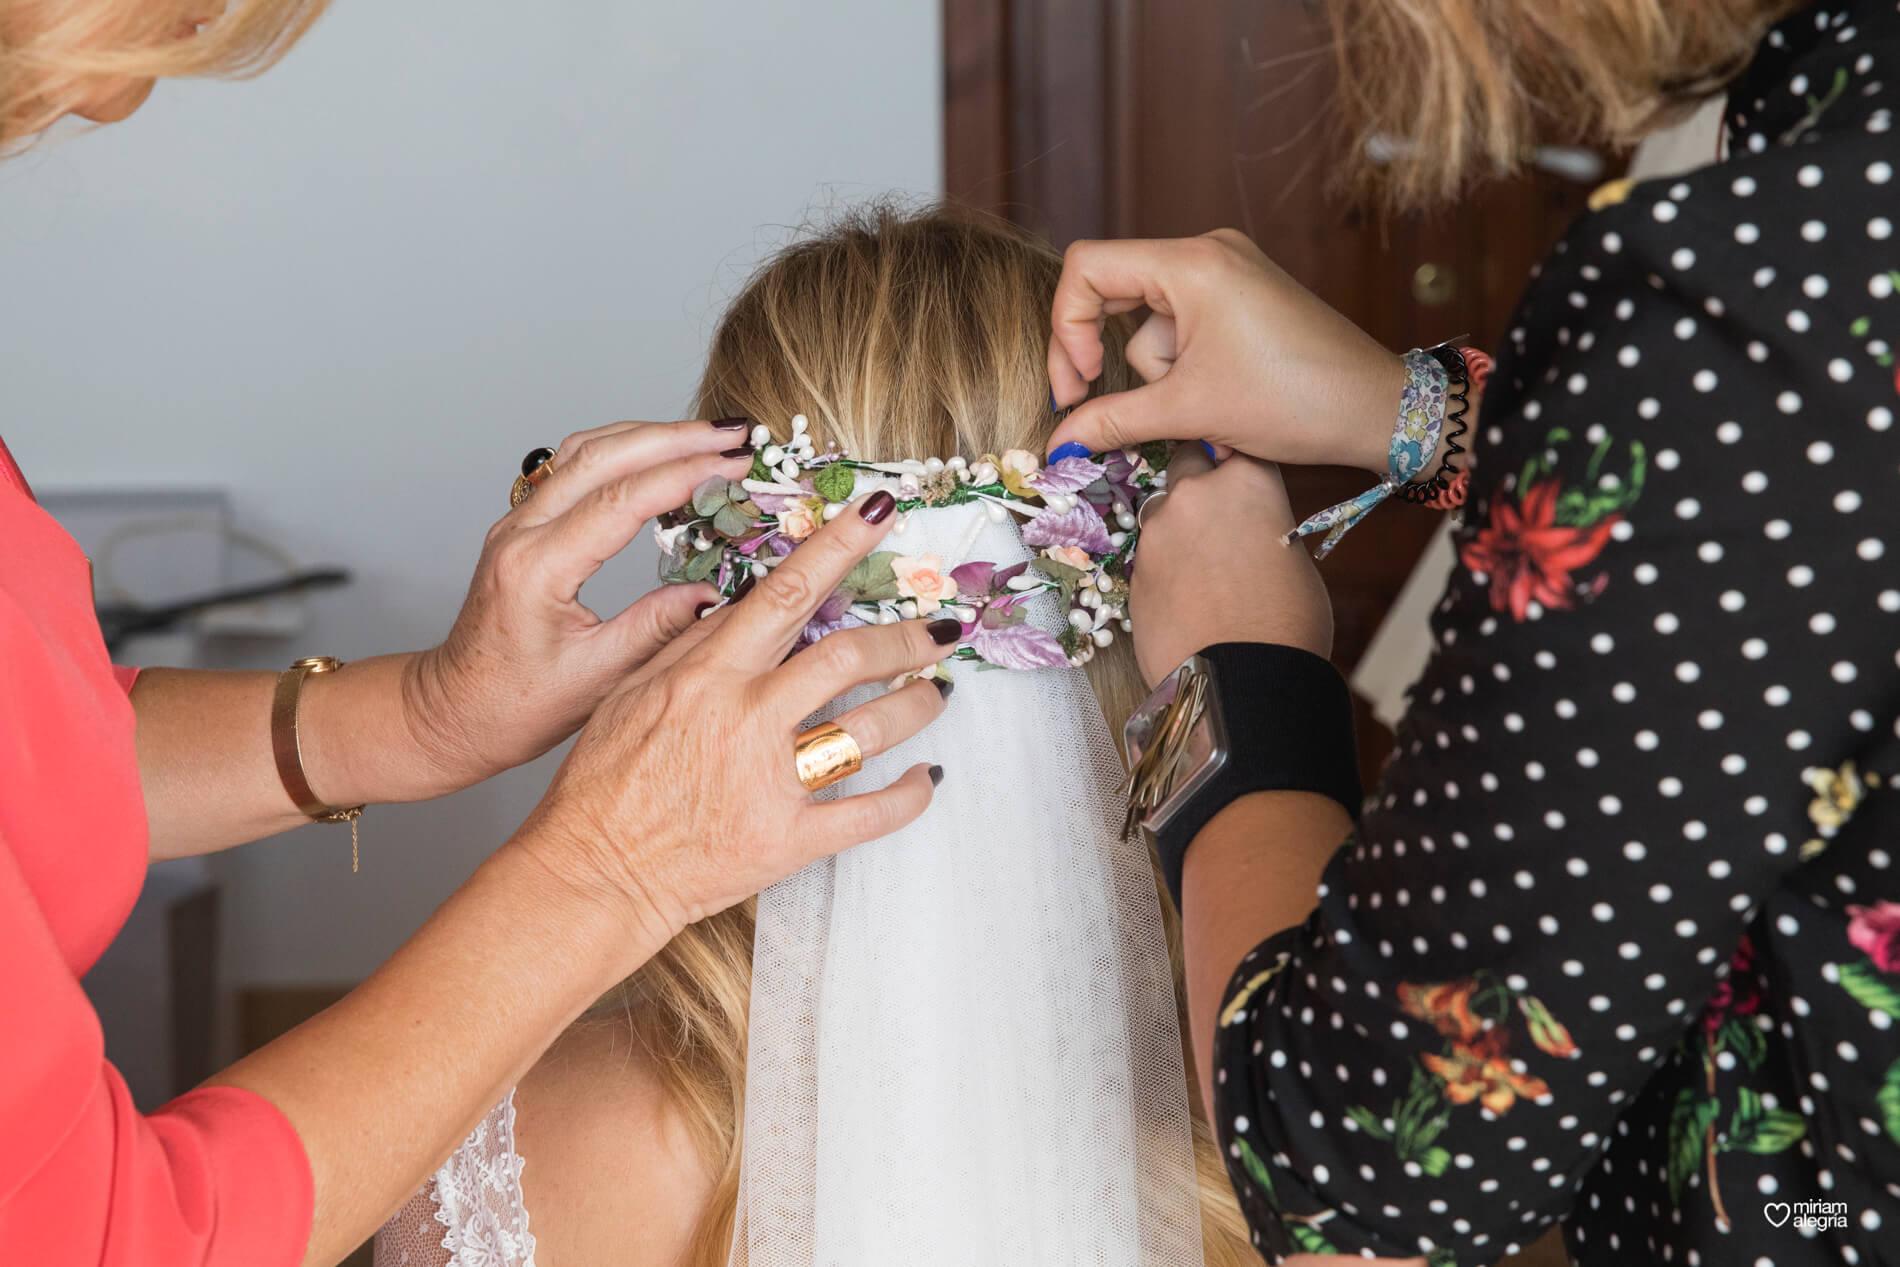 la-boda-de-alemc7-miriam-alegria-fotografos-boda-murcia-26